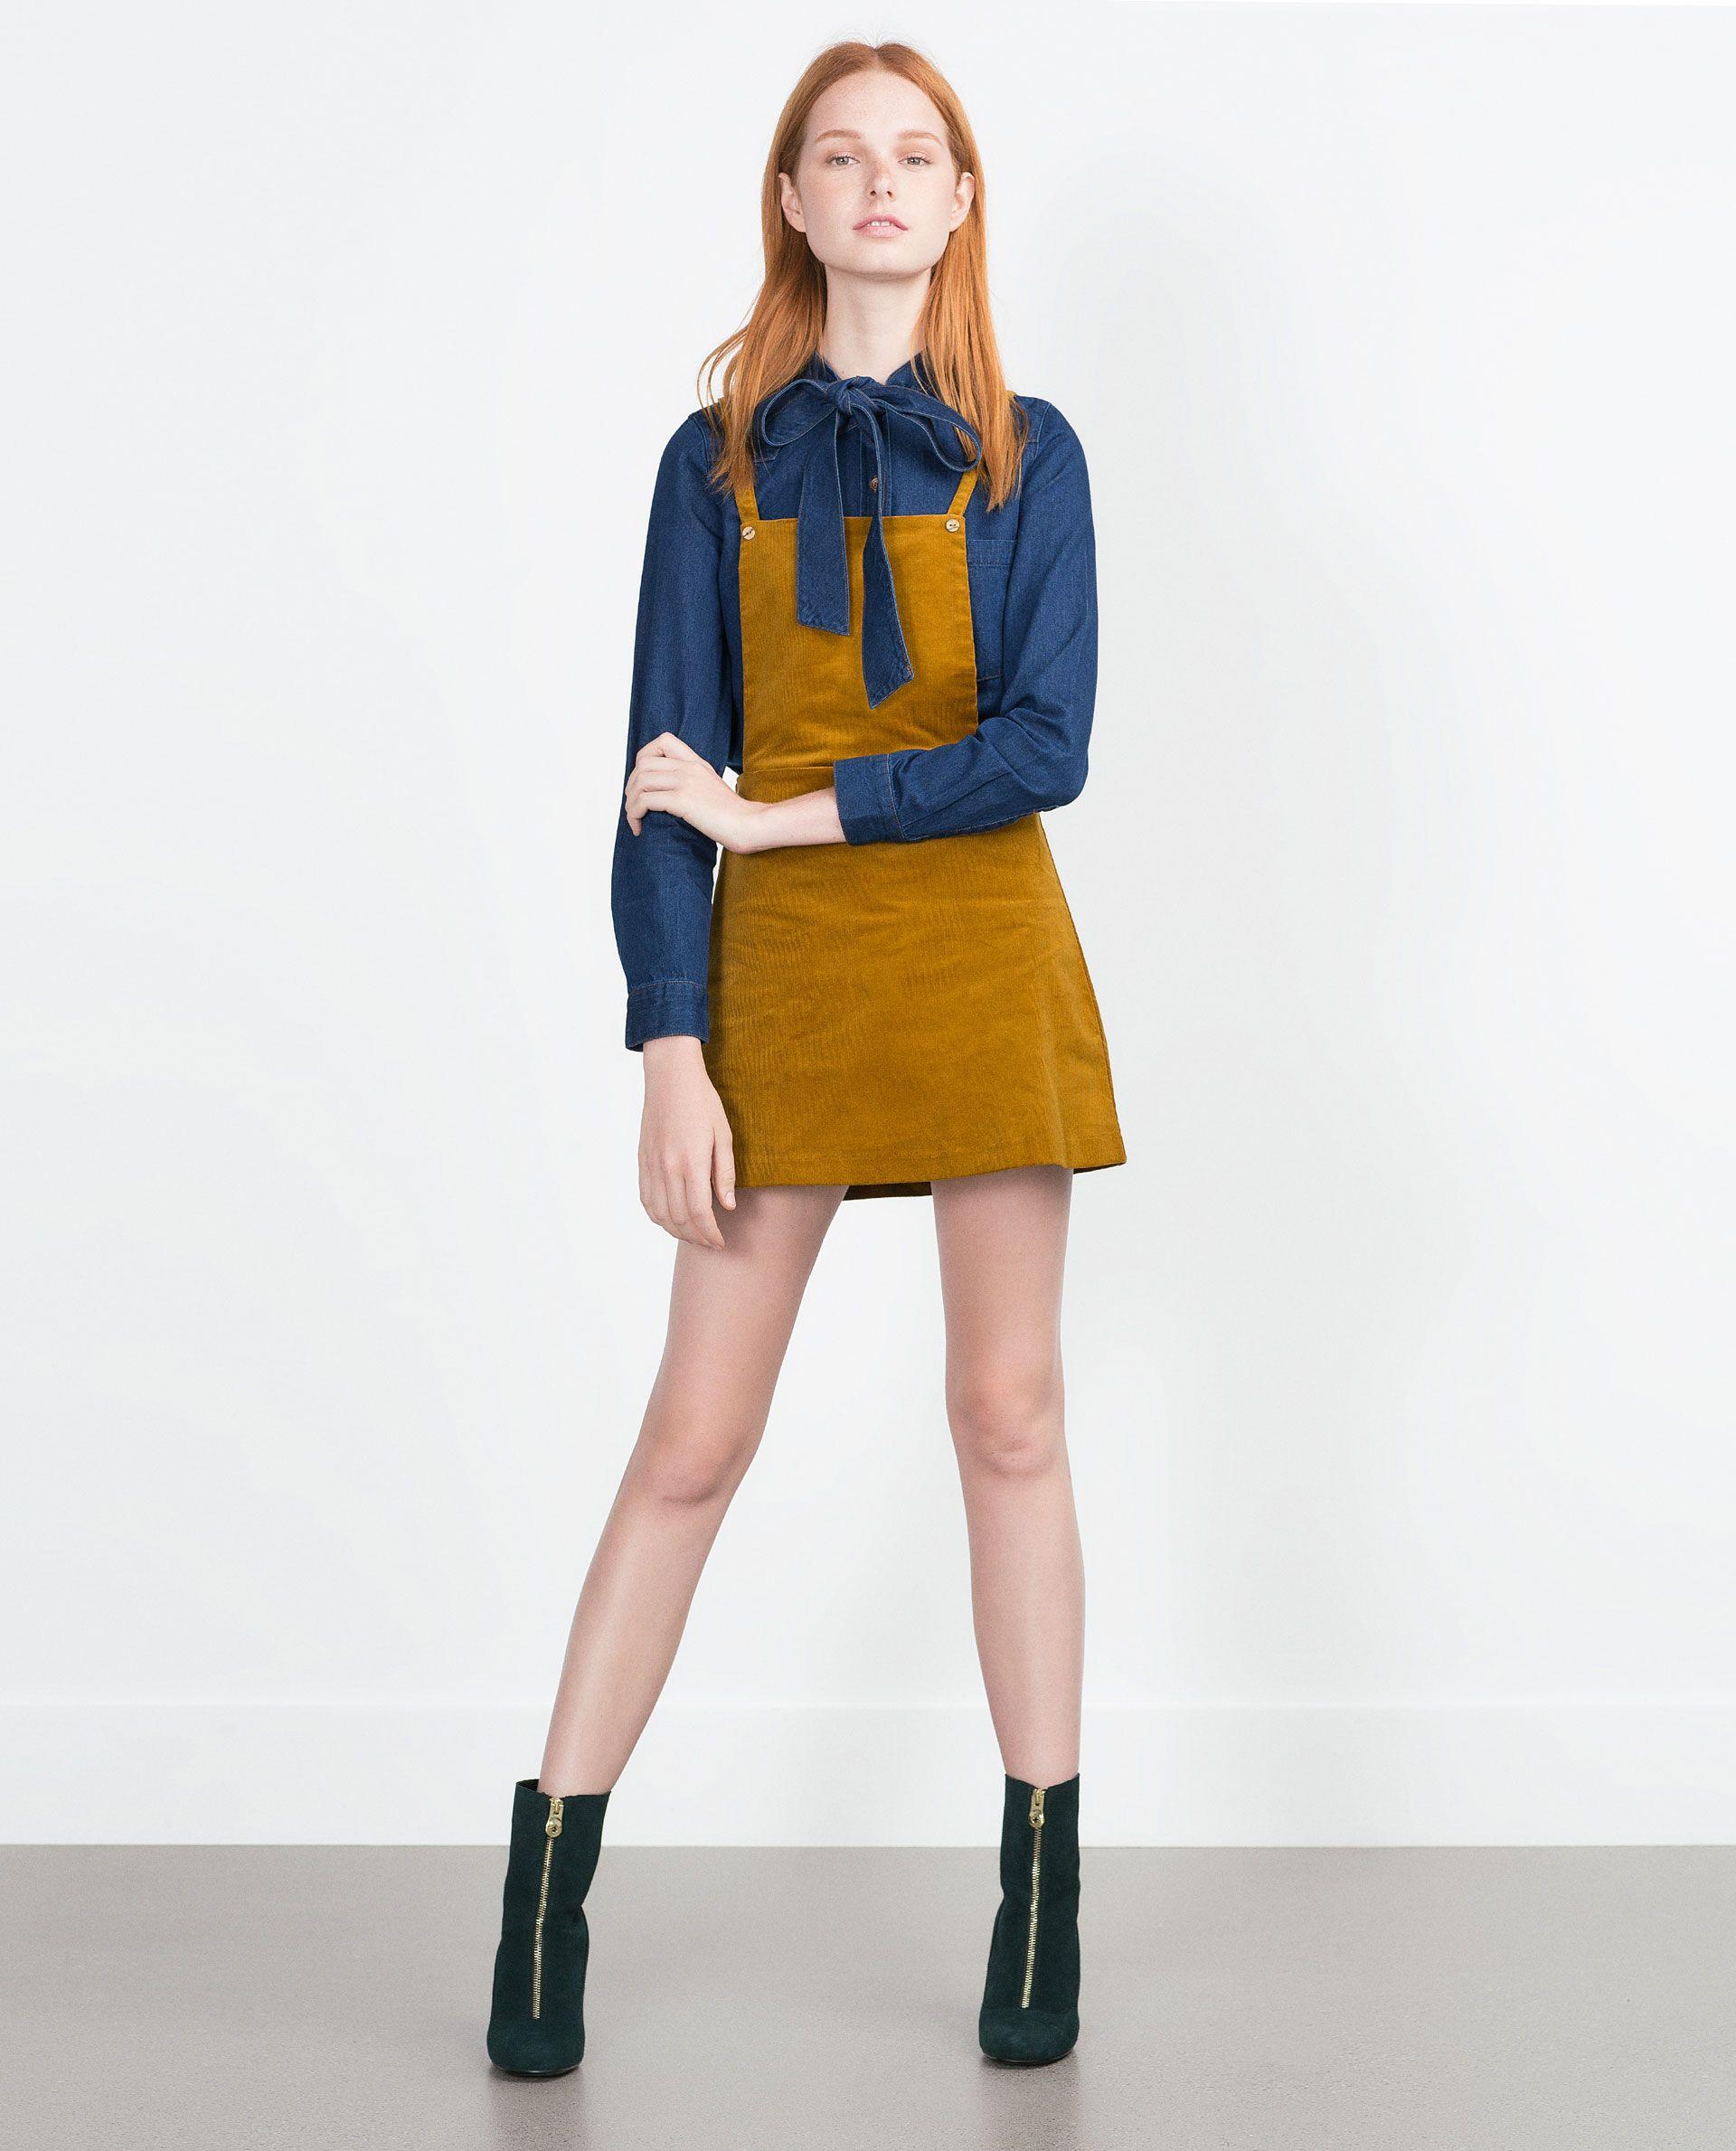 Zara CôteléOutfits KleidungMode Robe Salopette Trf Velours Yfg76yvb